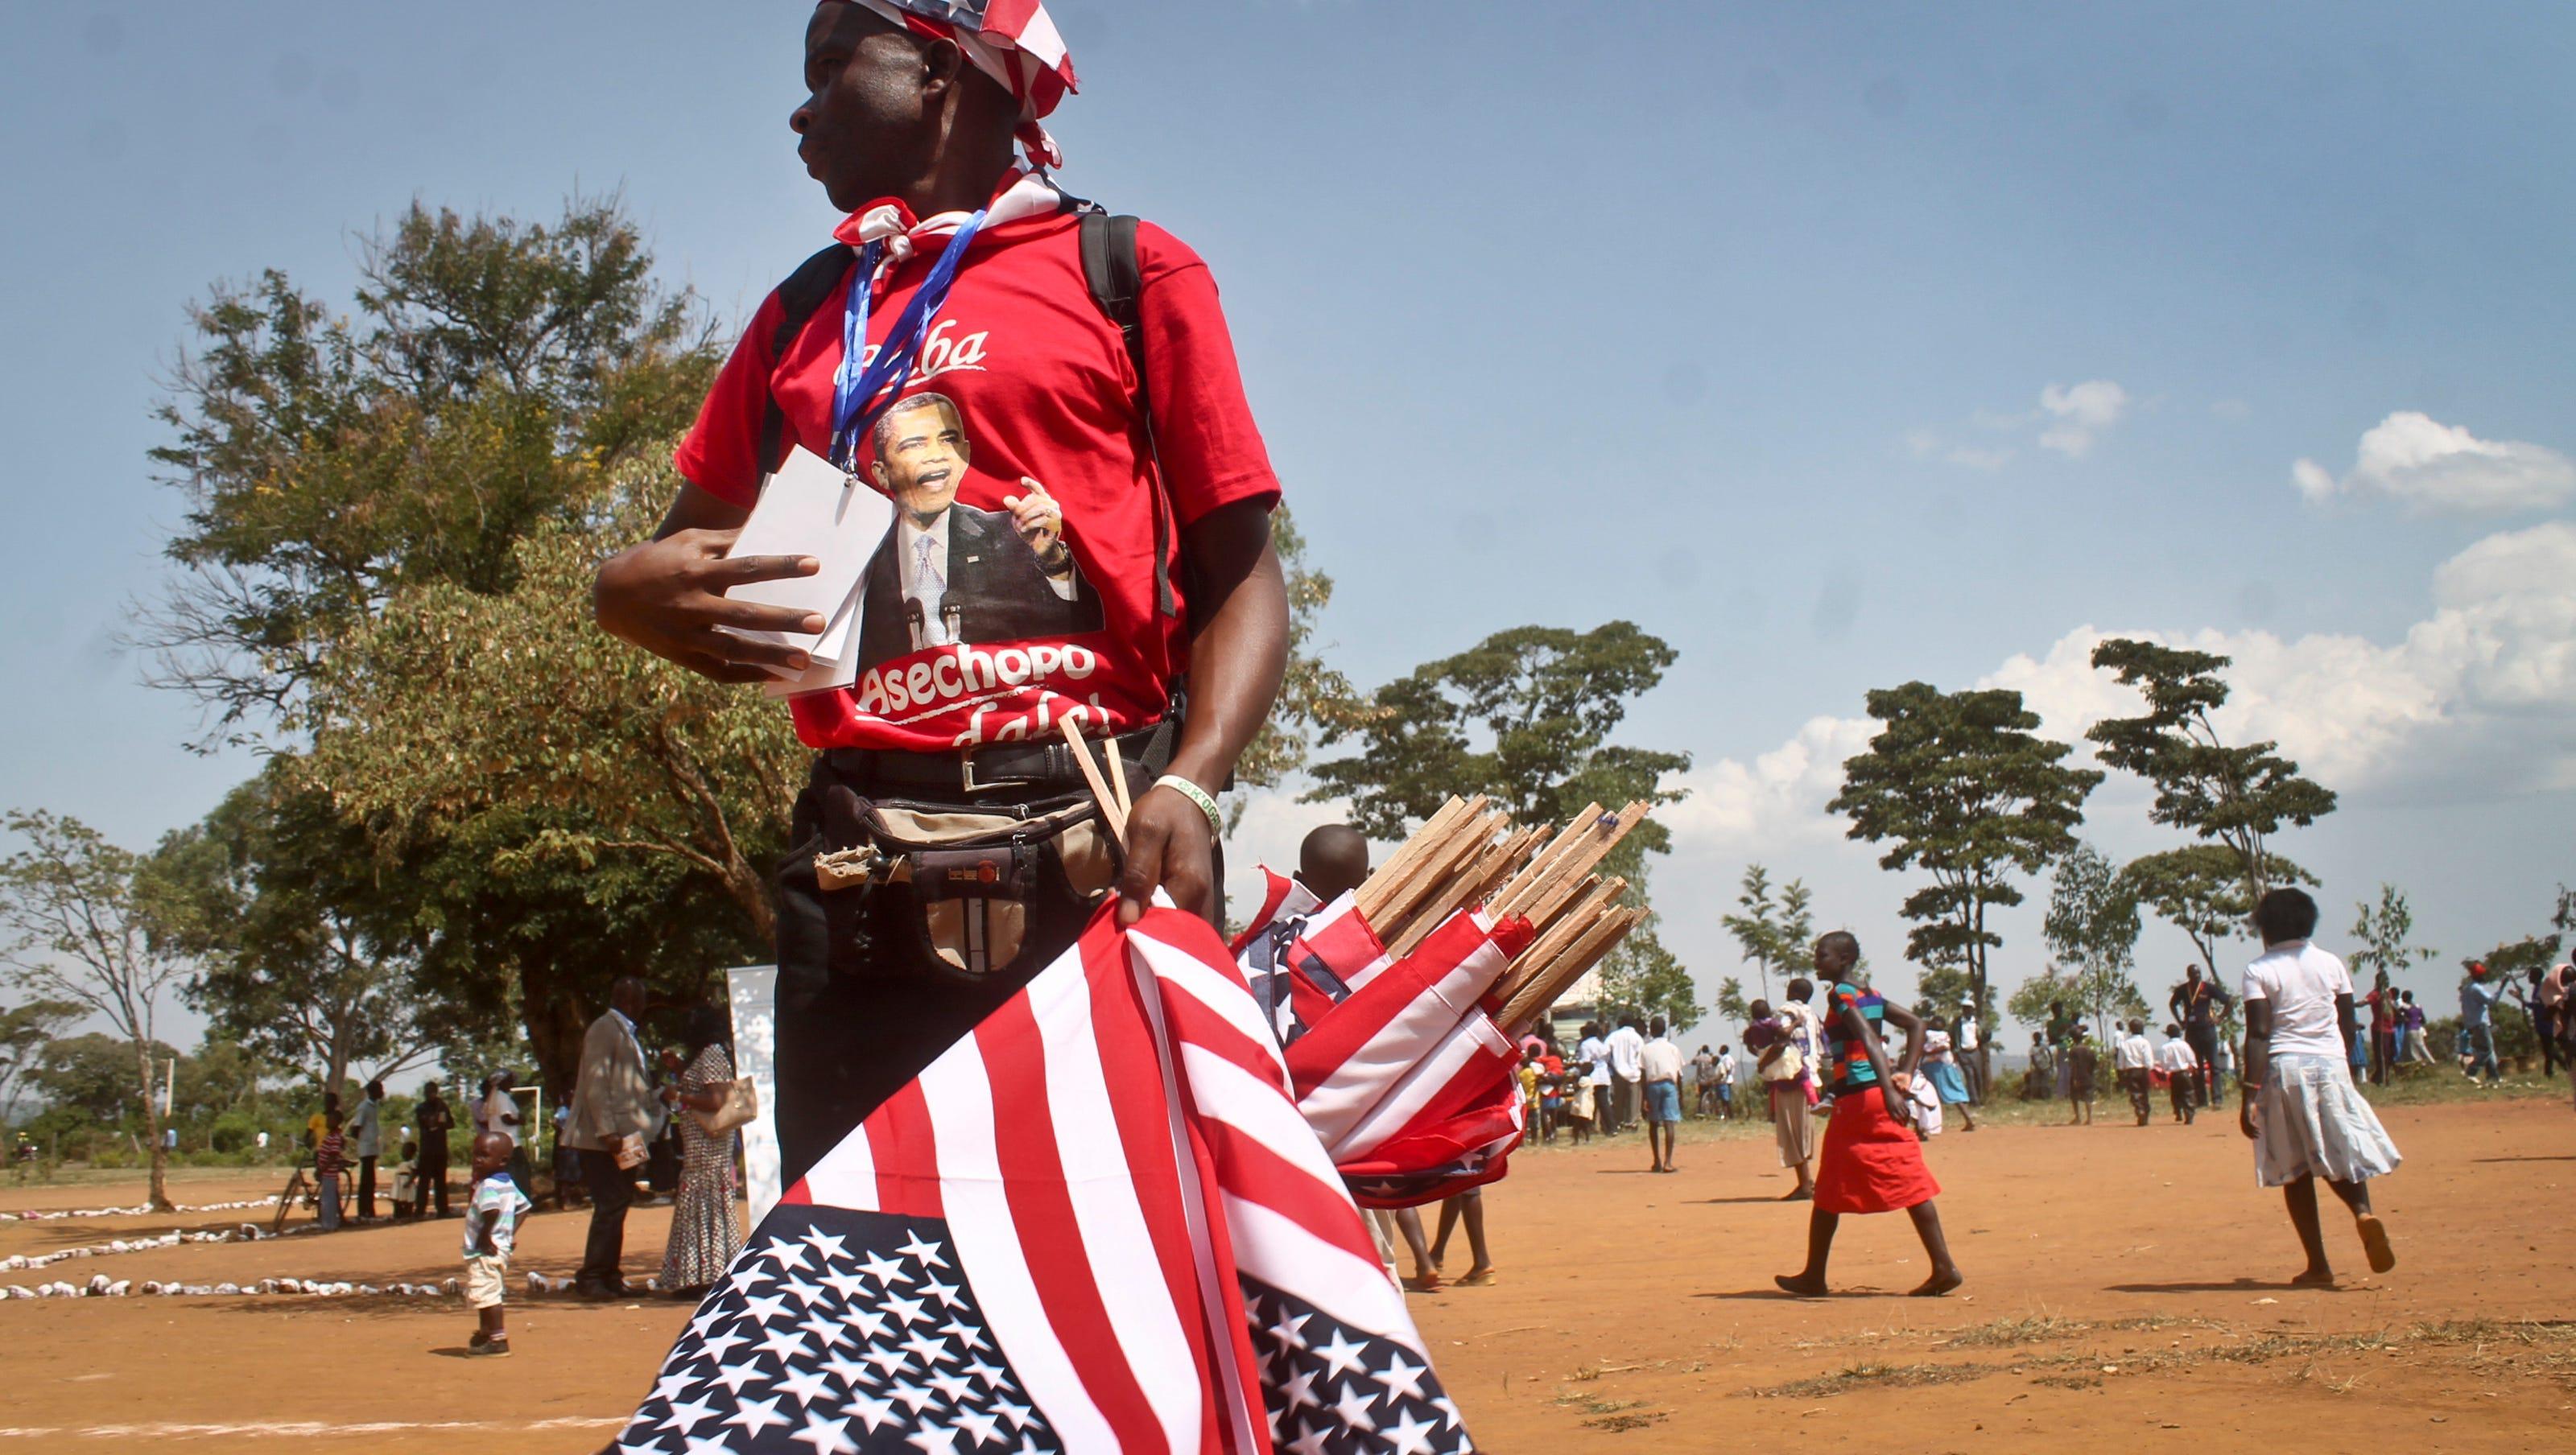 Barack Obama Tourism Funding Down In His Ancestral Village In Kenya